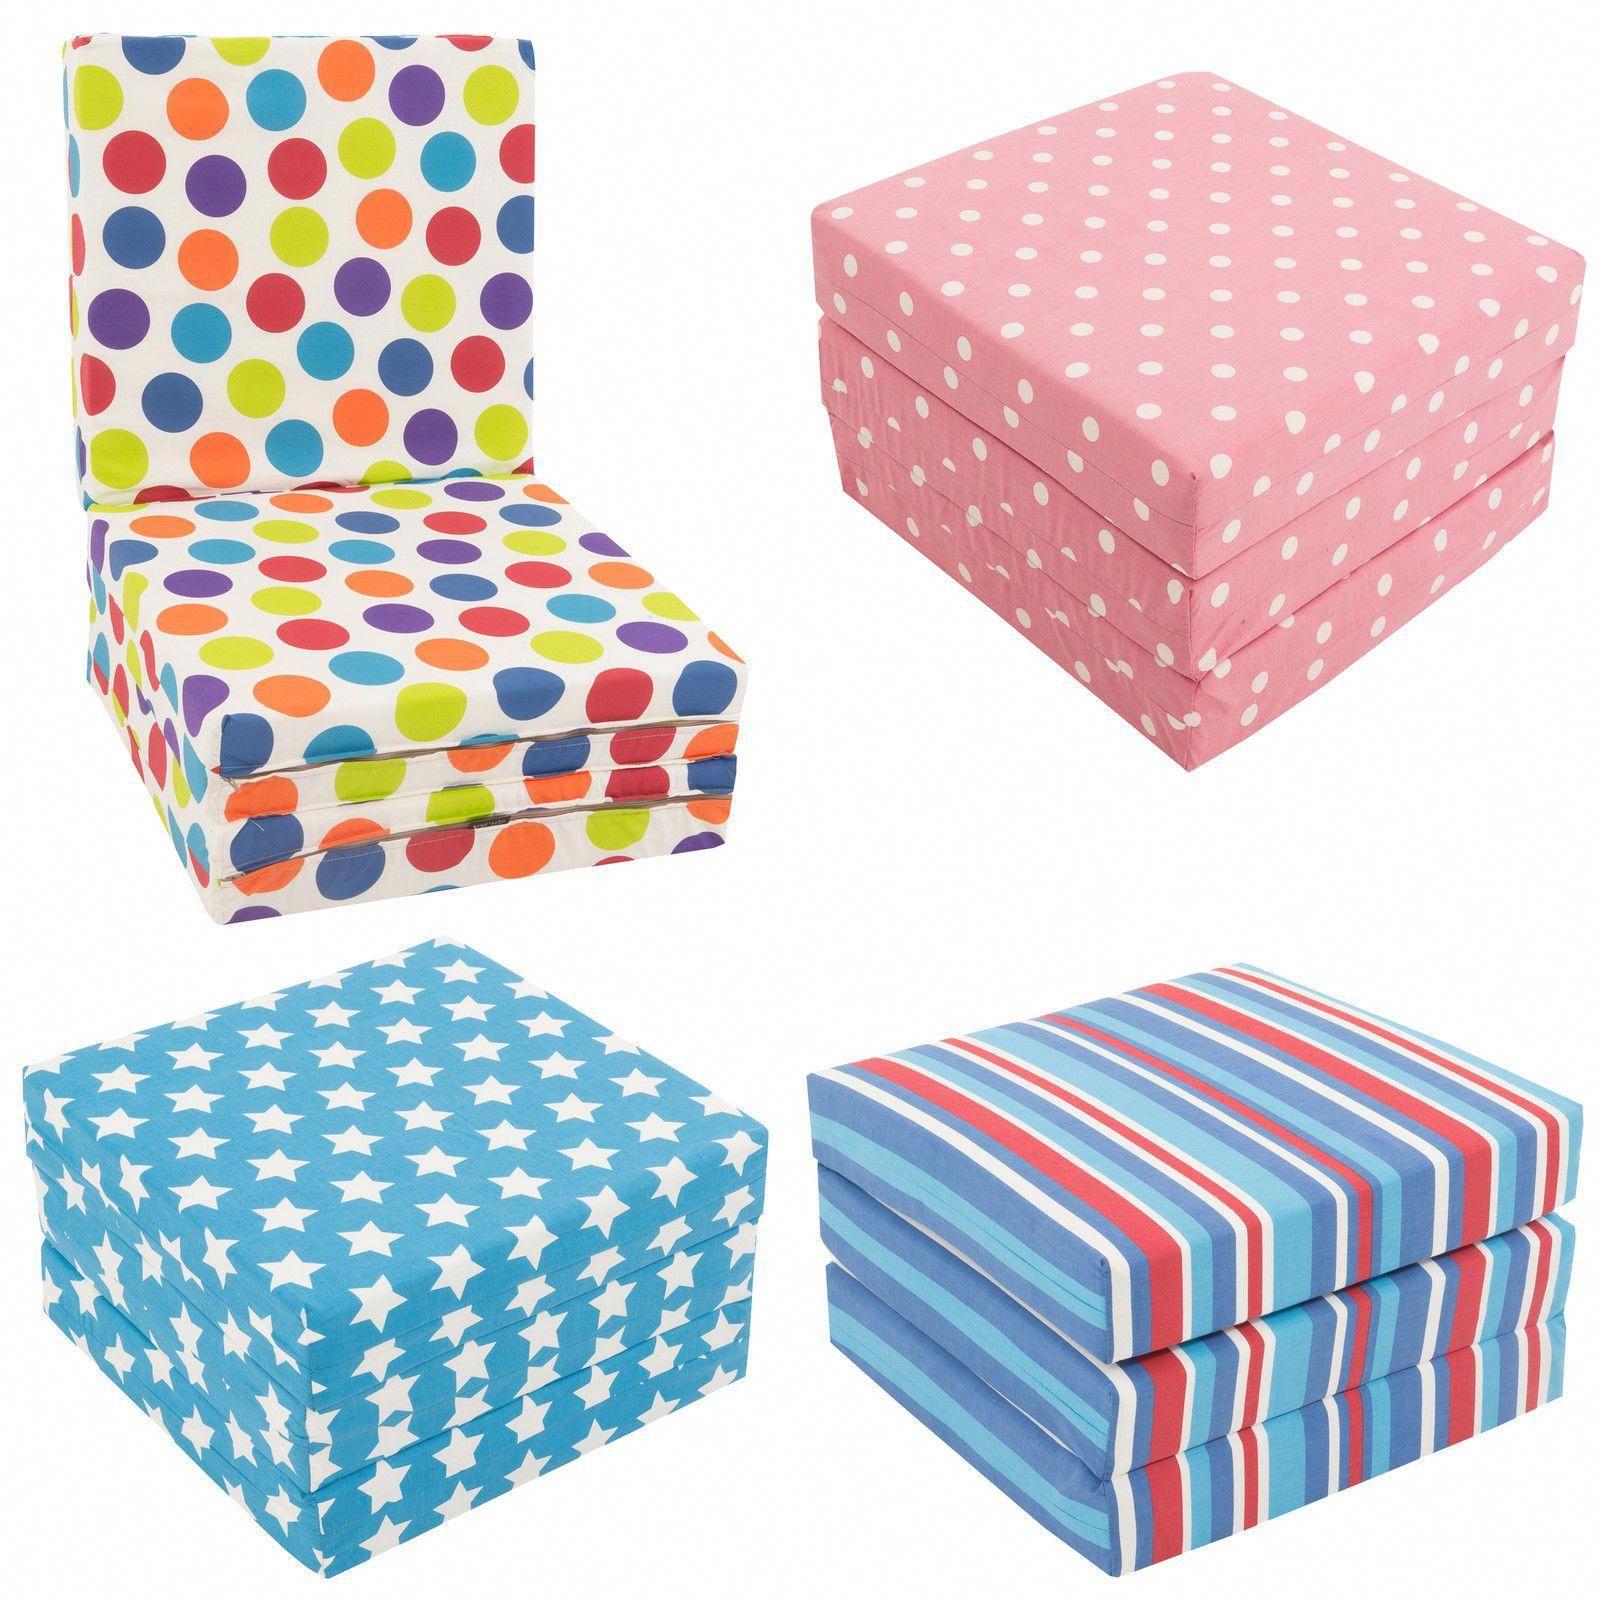 Fold Out Chair Bed Kids White Rocking Wooden Legs Folding Single Futon Guest Z Childrens Chairbed Gilda Ebay Childrenschair